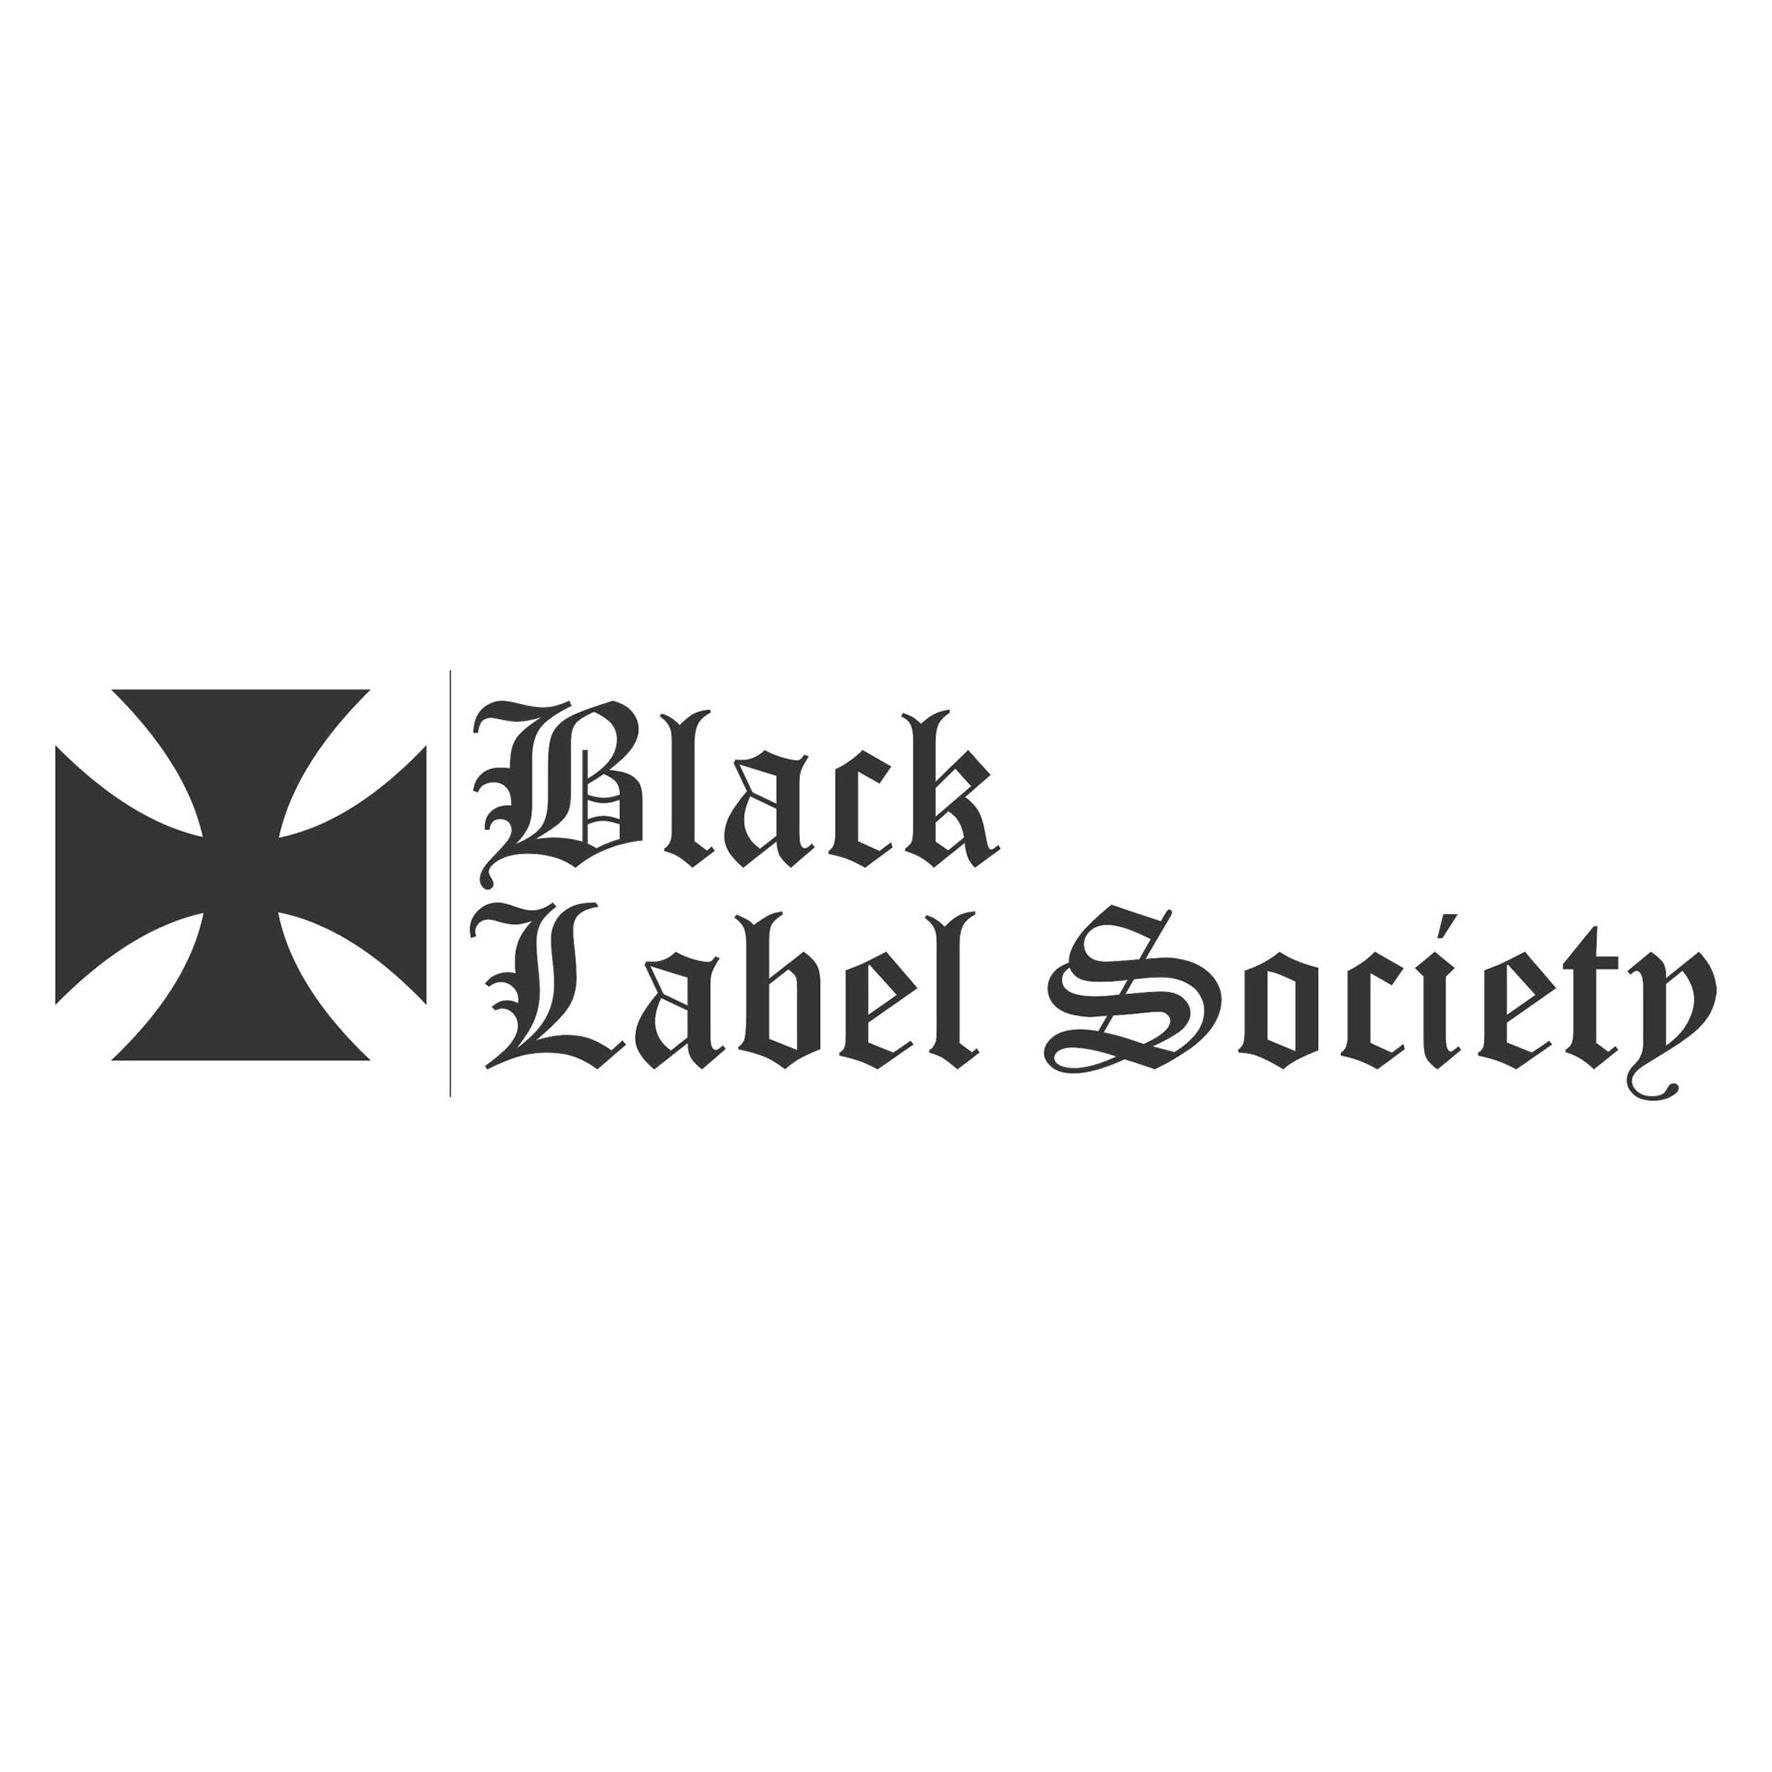 Regata Black Label Society  d5027d1ccb8bc